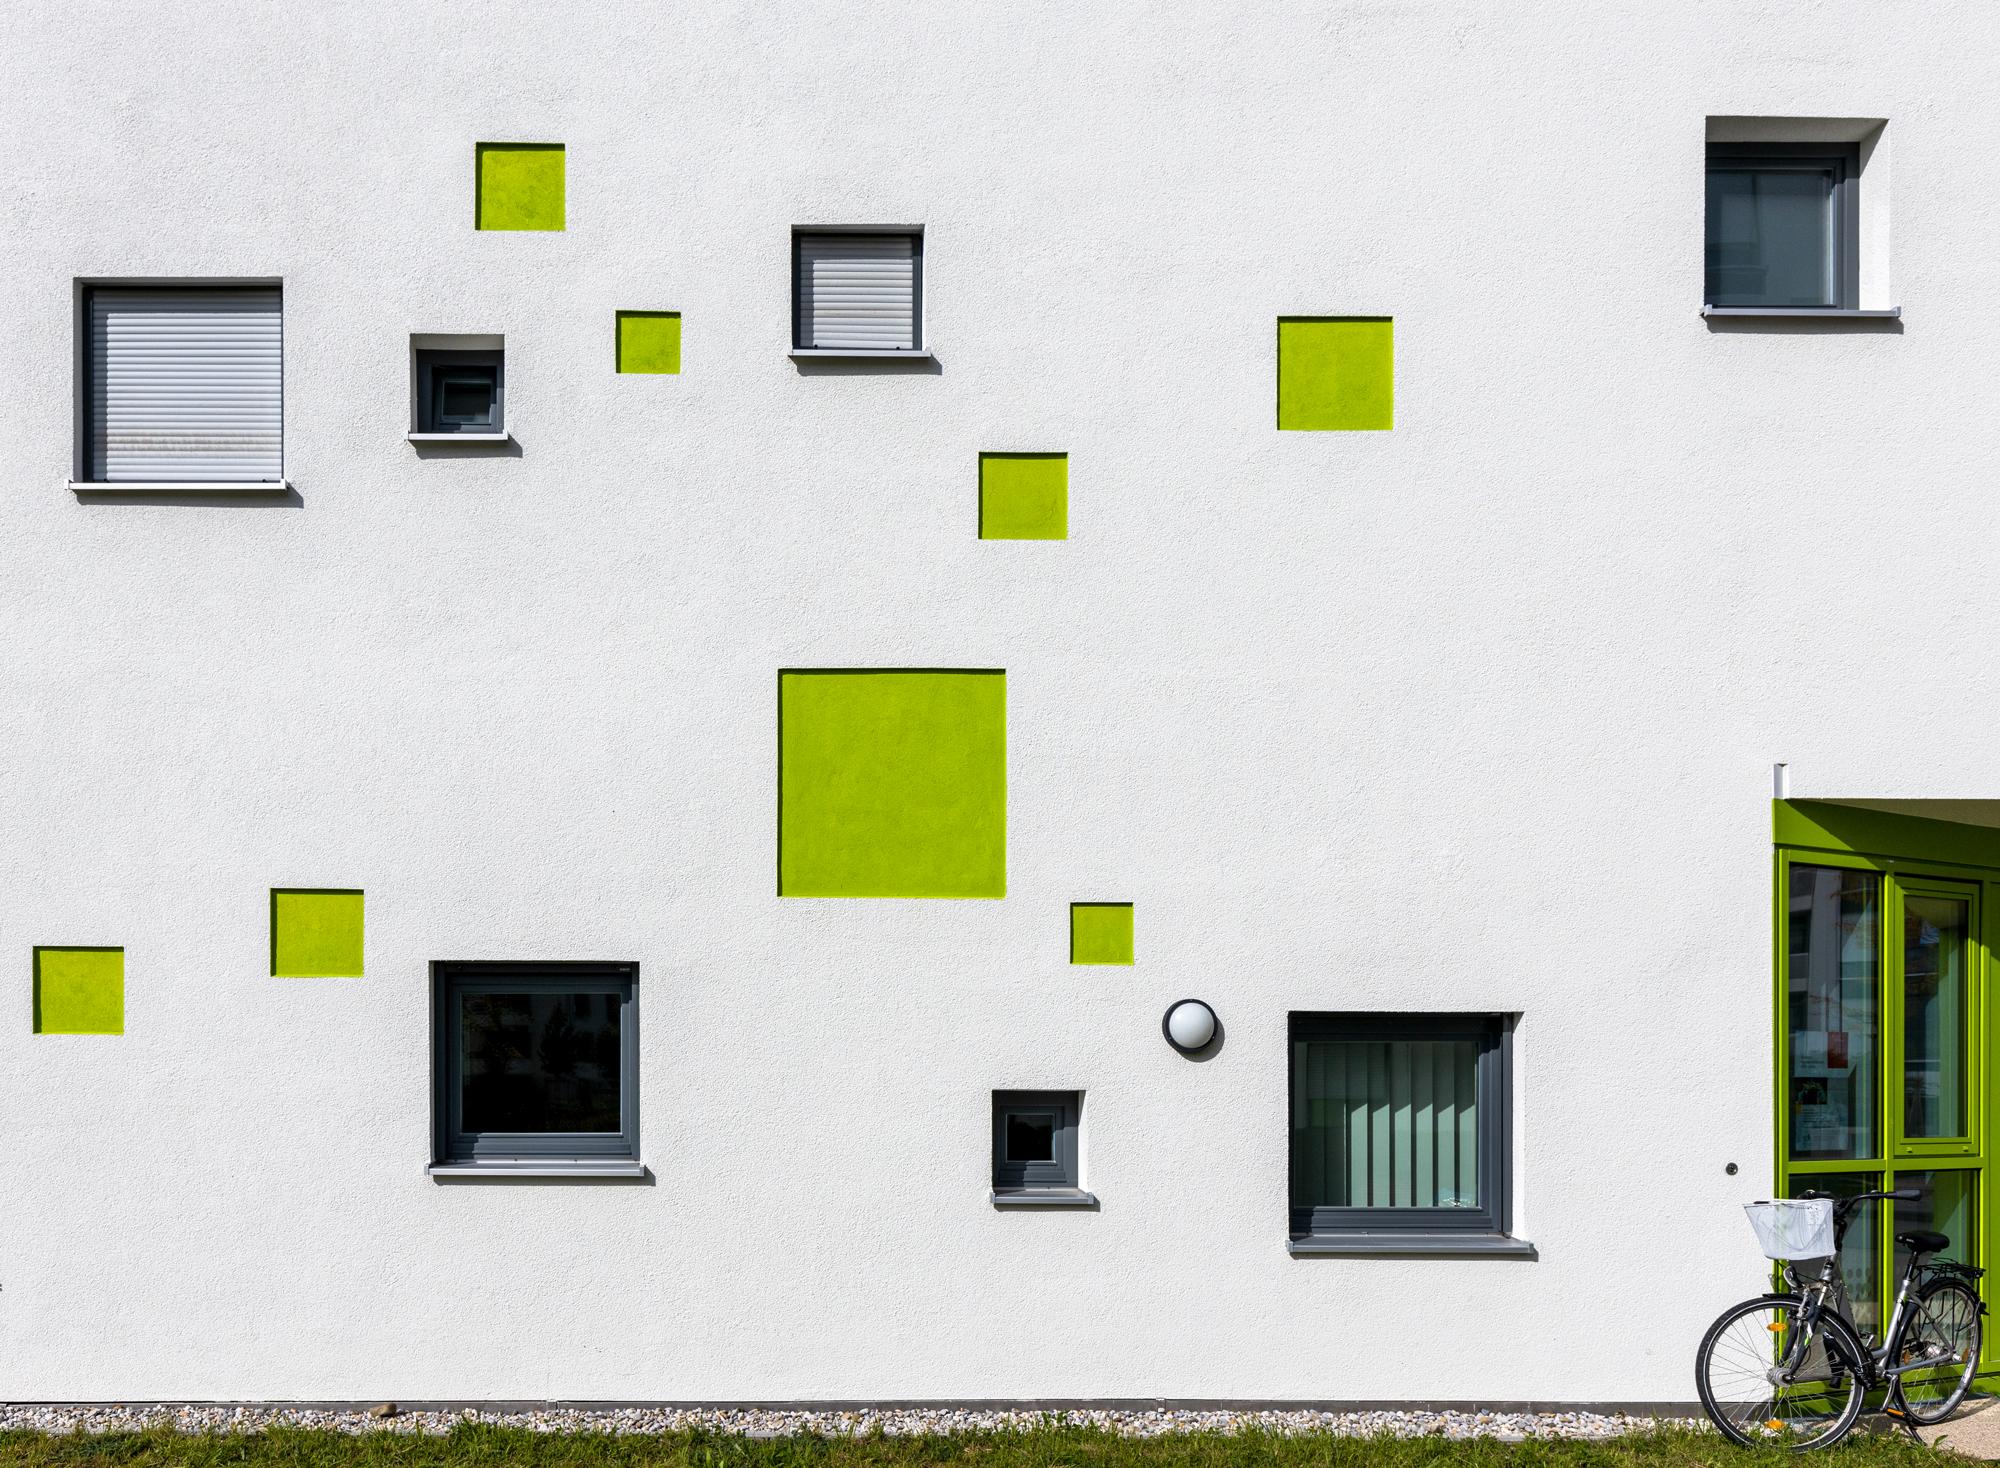 Die grünen Quadrate